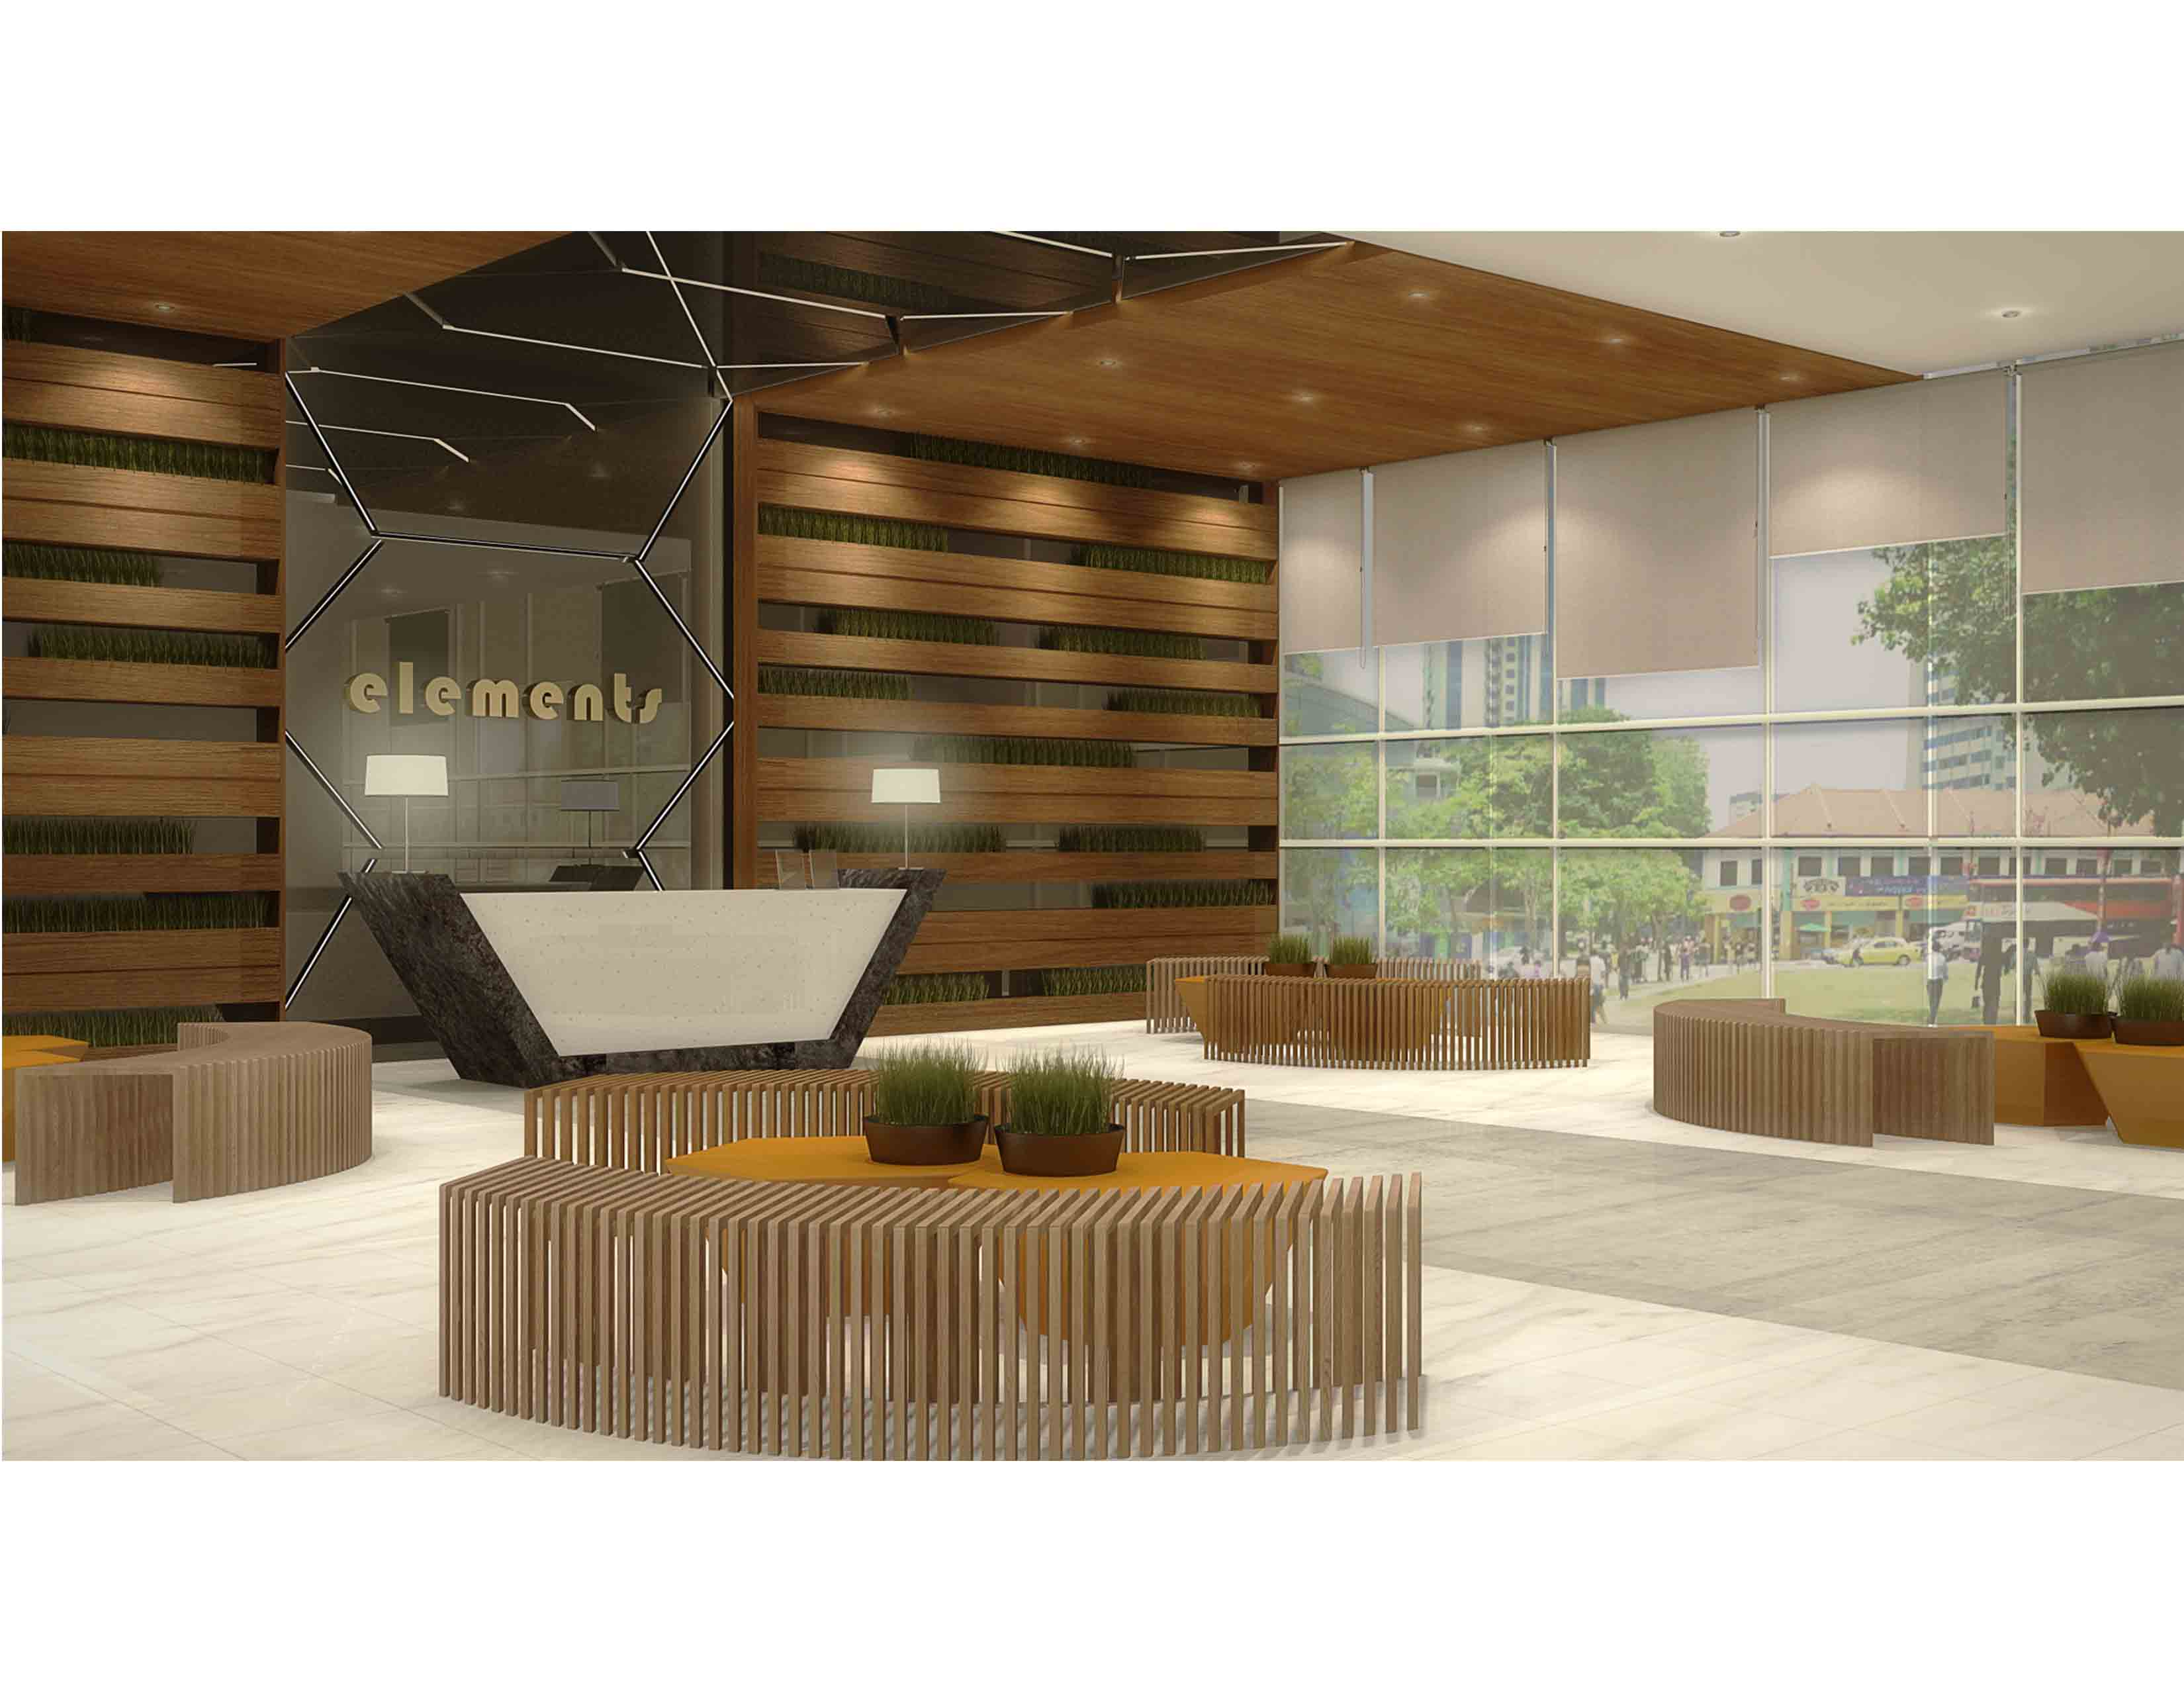 Elements Luxury Flats